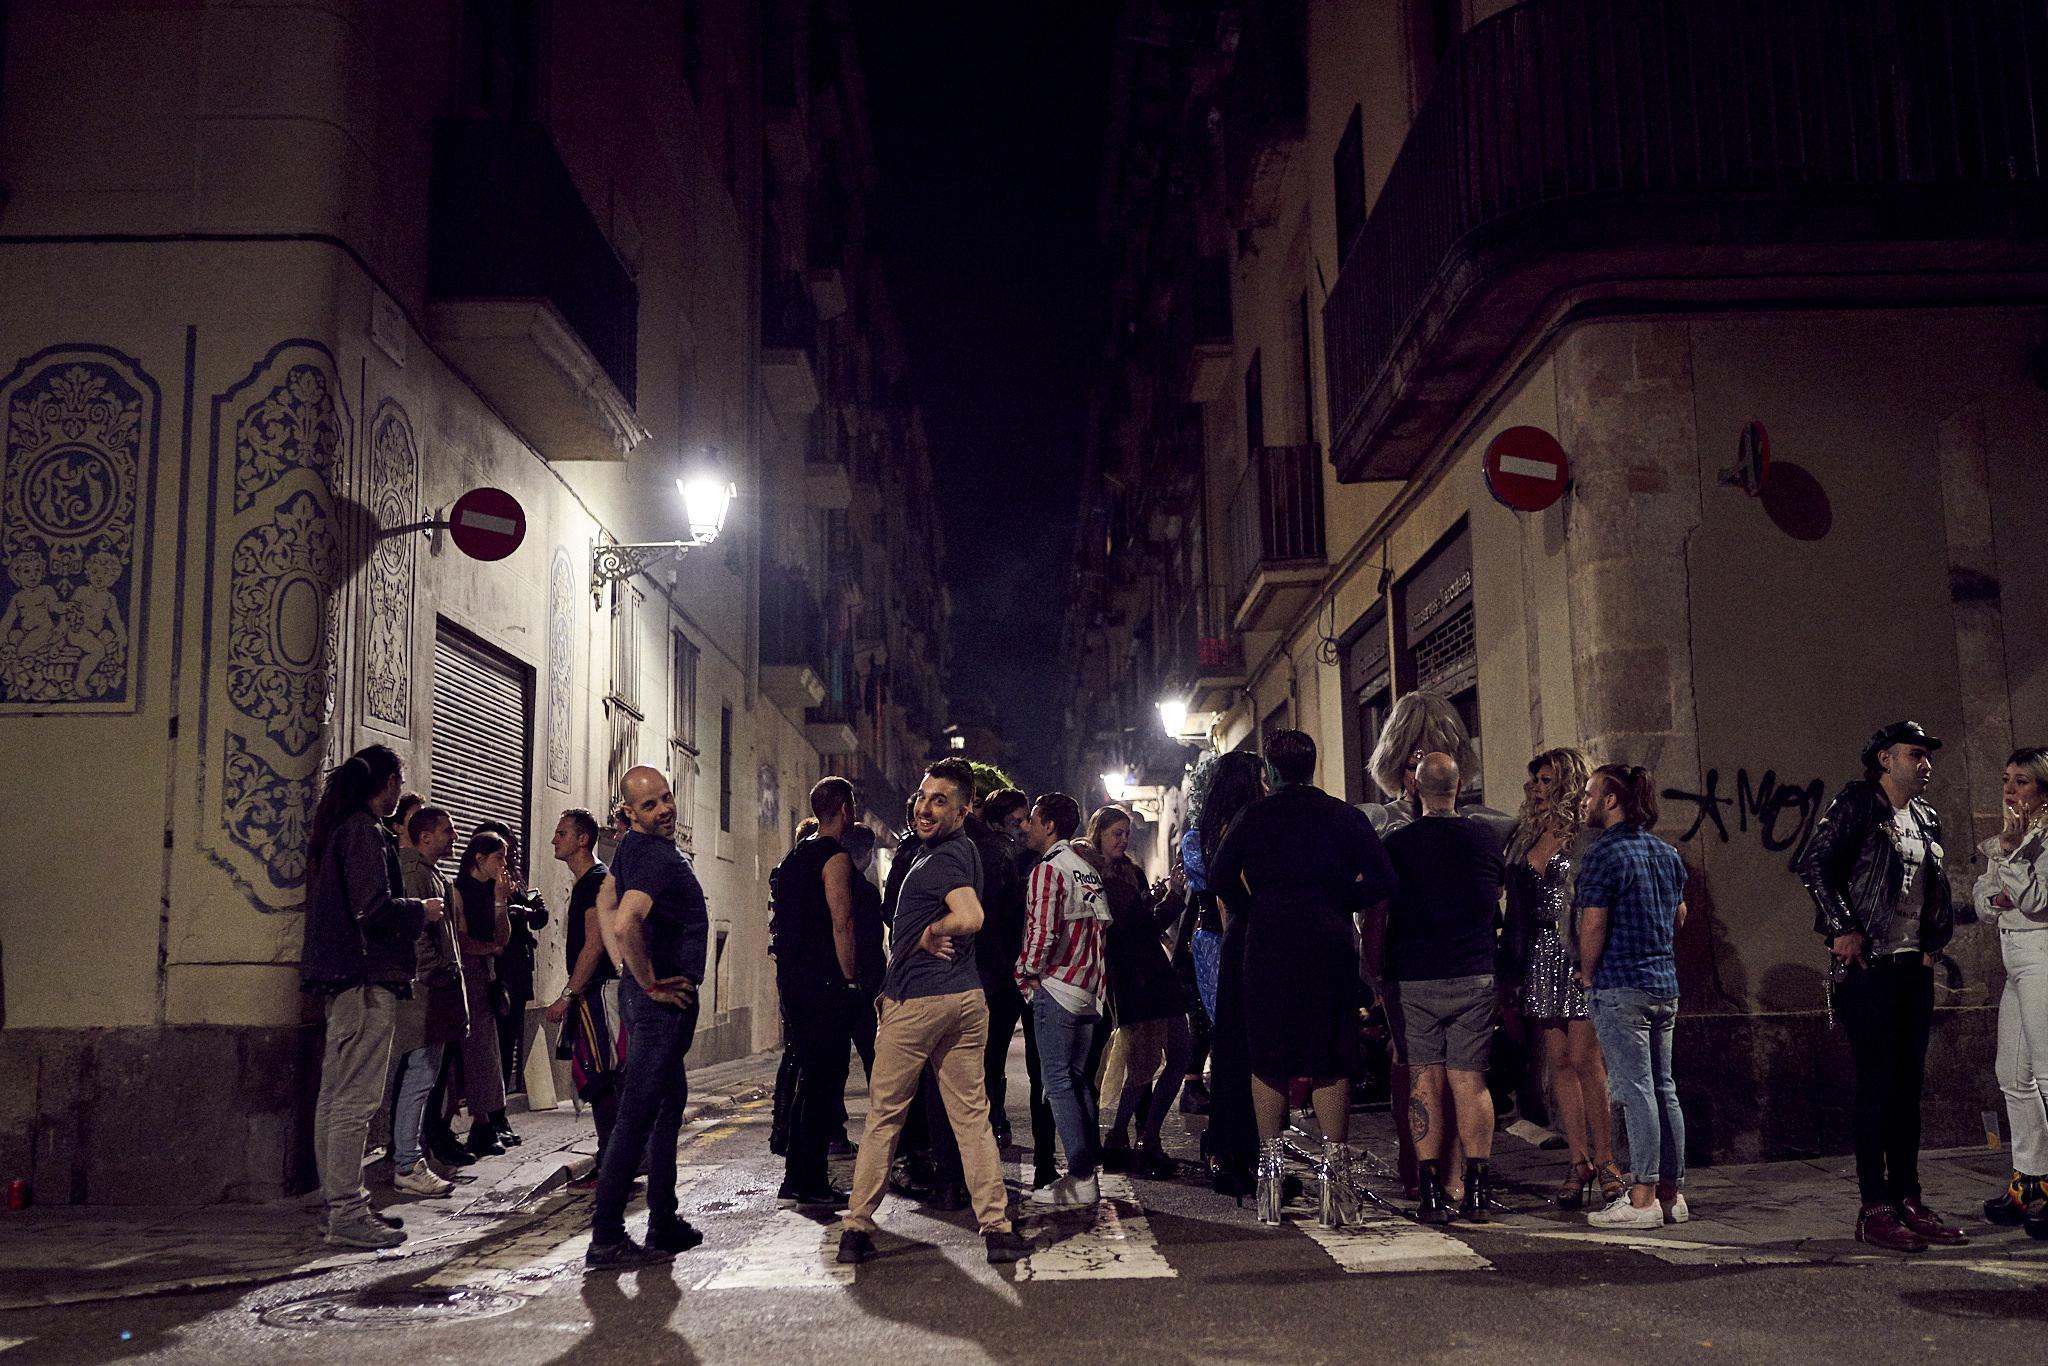 Fotografo Barcelona Drags La Logia _LME5078.jpg